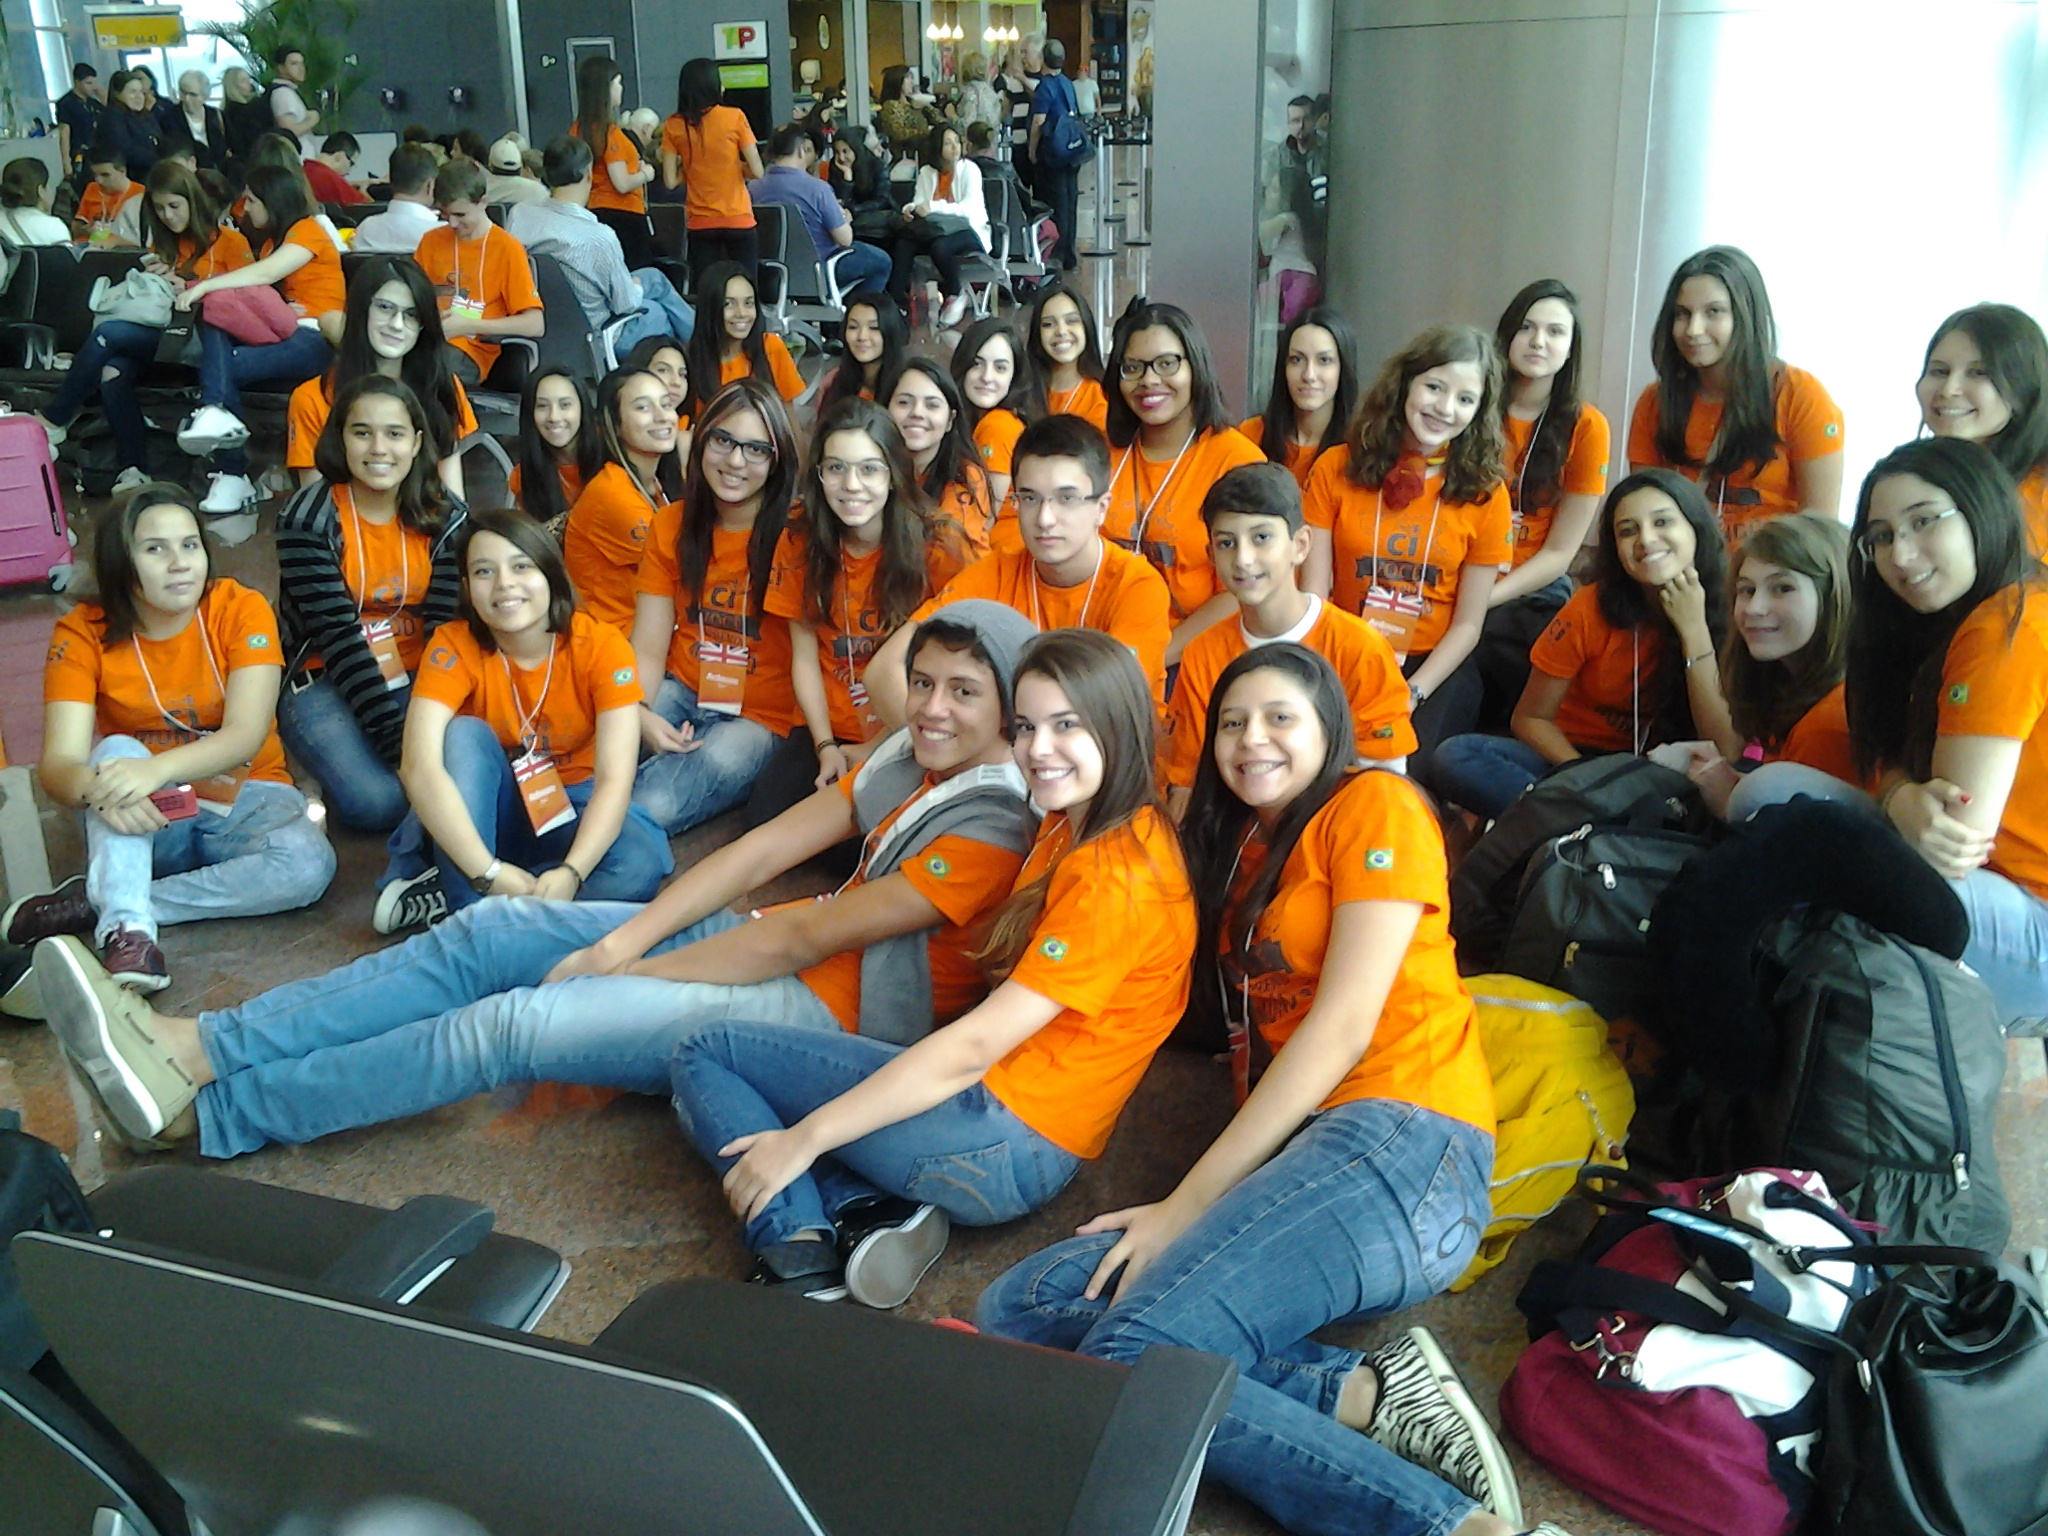 Grupo no aeroporto